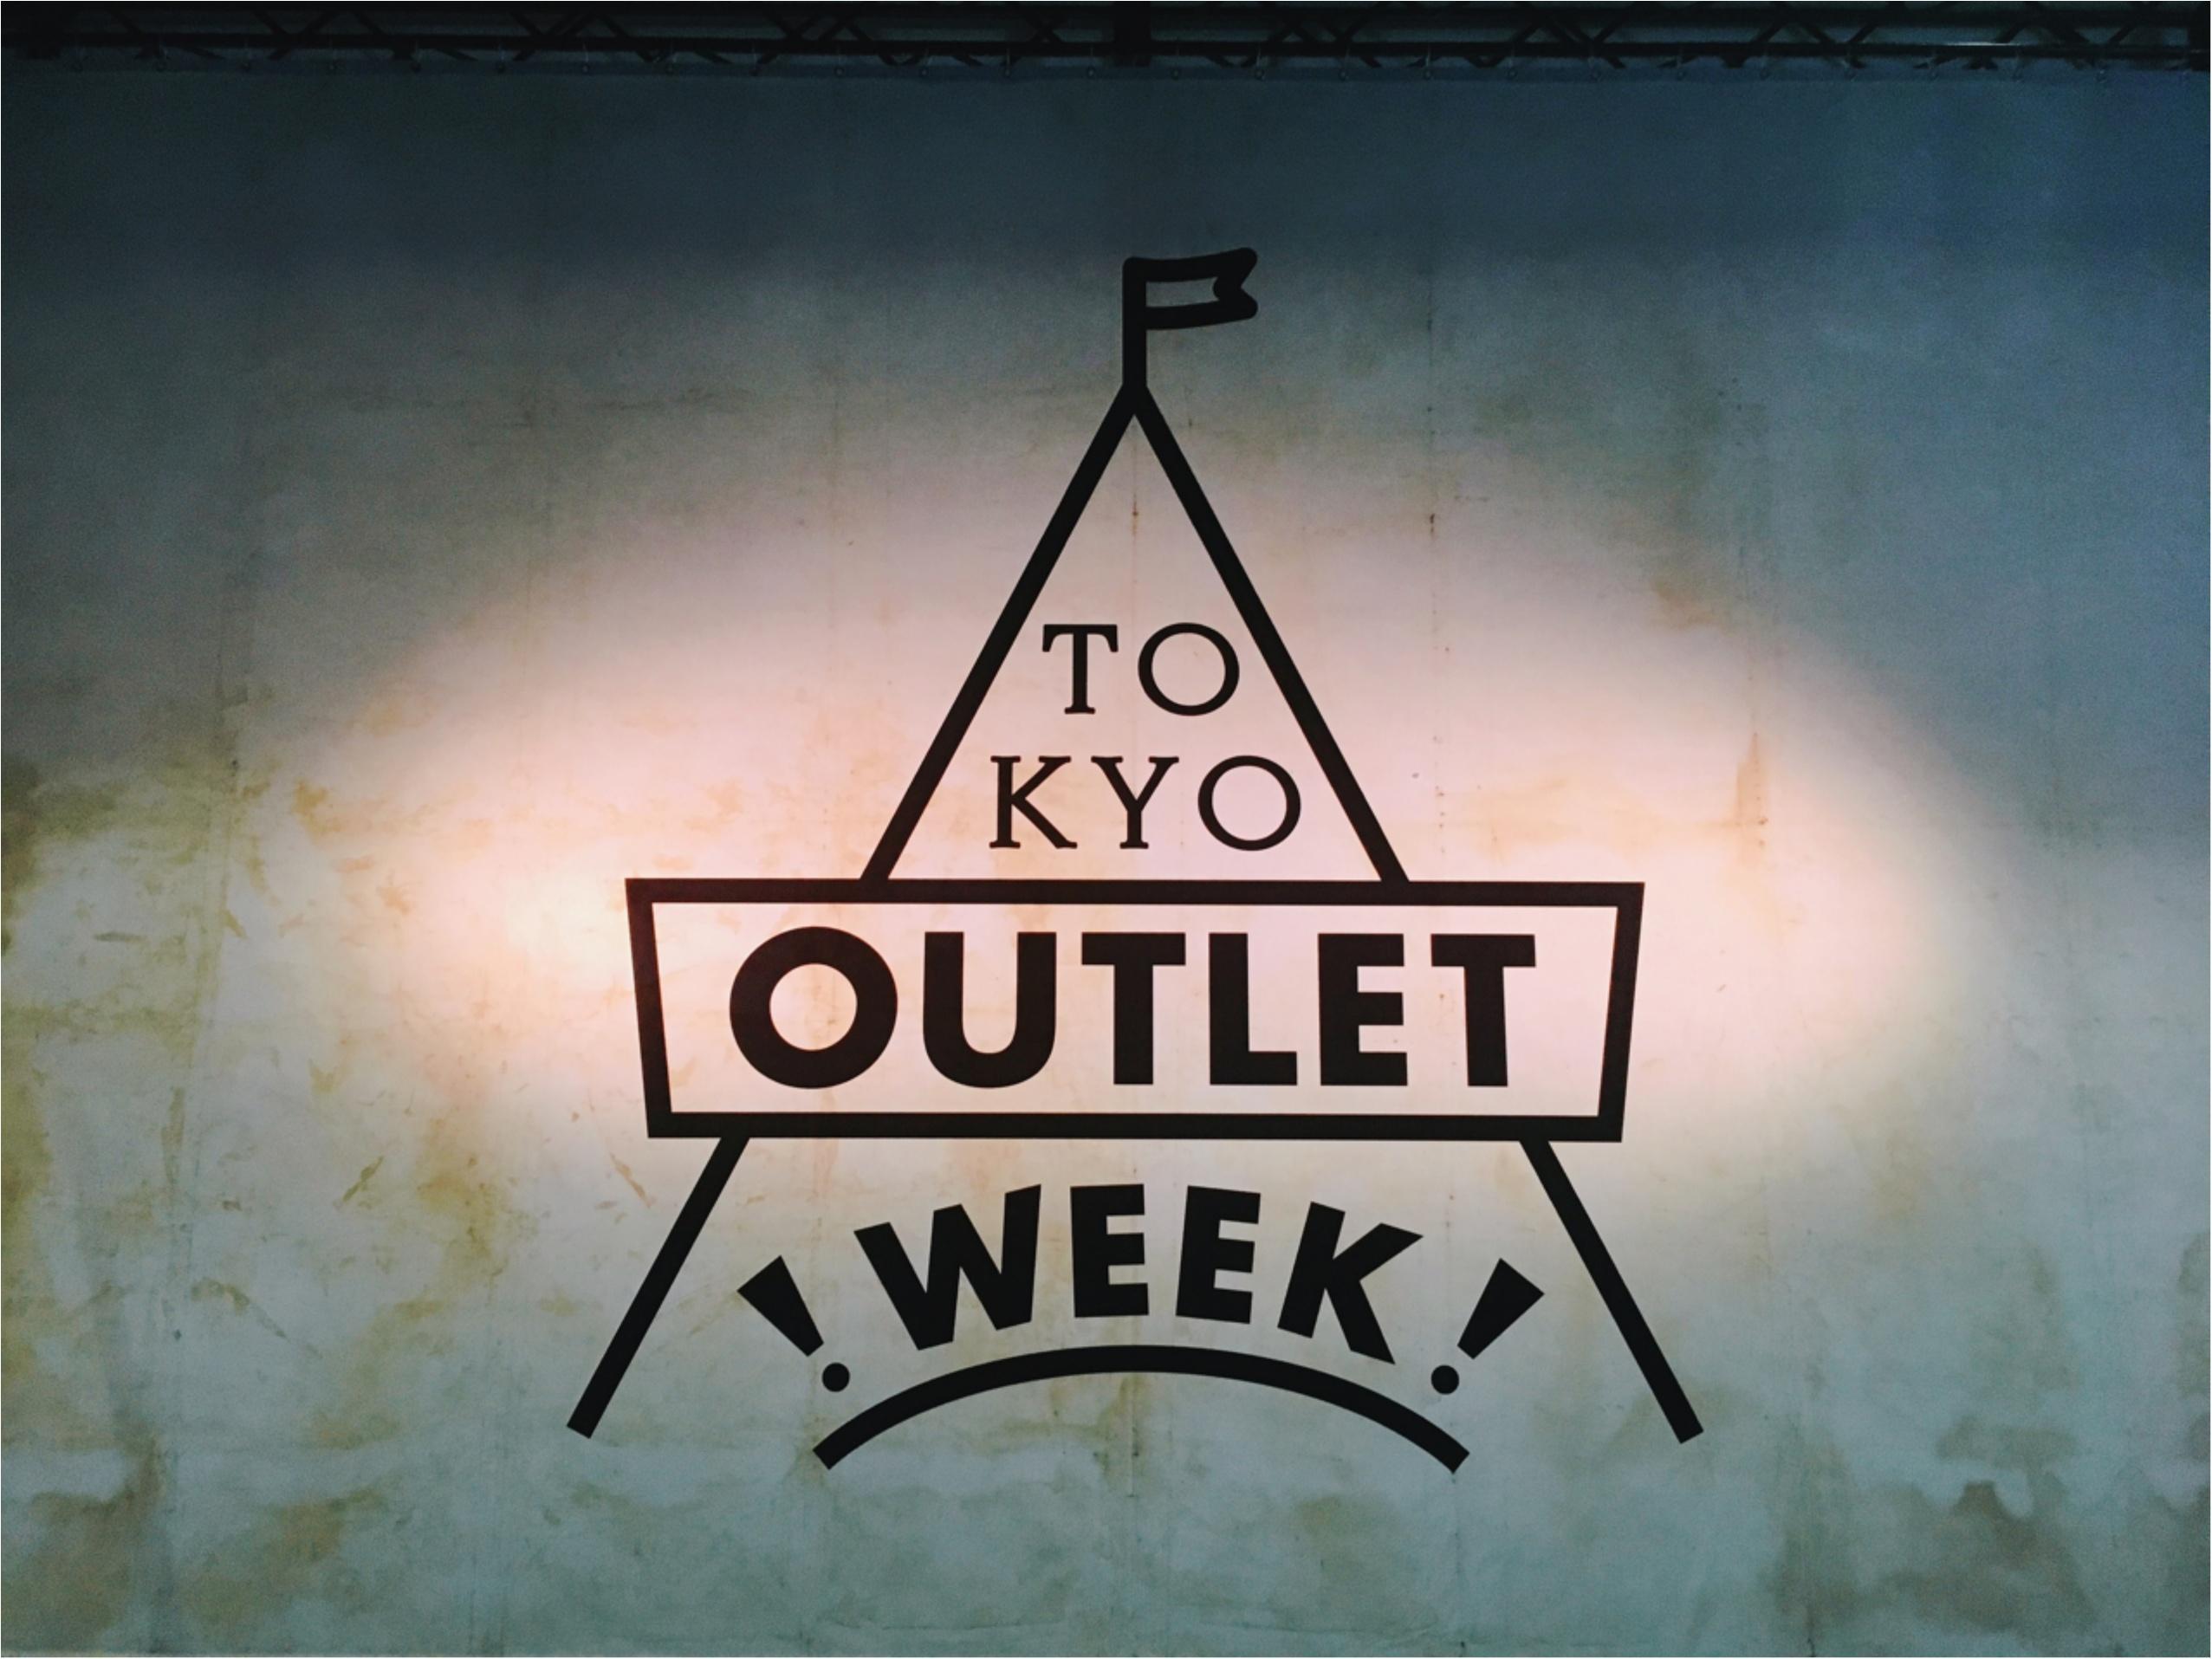 【TOKYO OUTLET WEEK】週末はファッションアウトレットイベントへ!お買い得すぎる戦利品公開♡_1